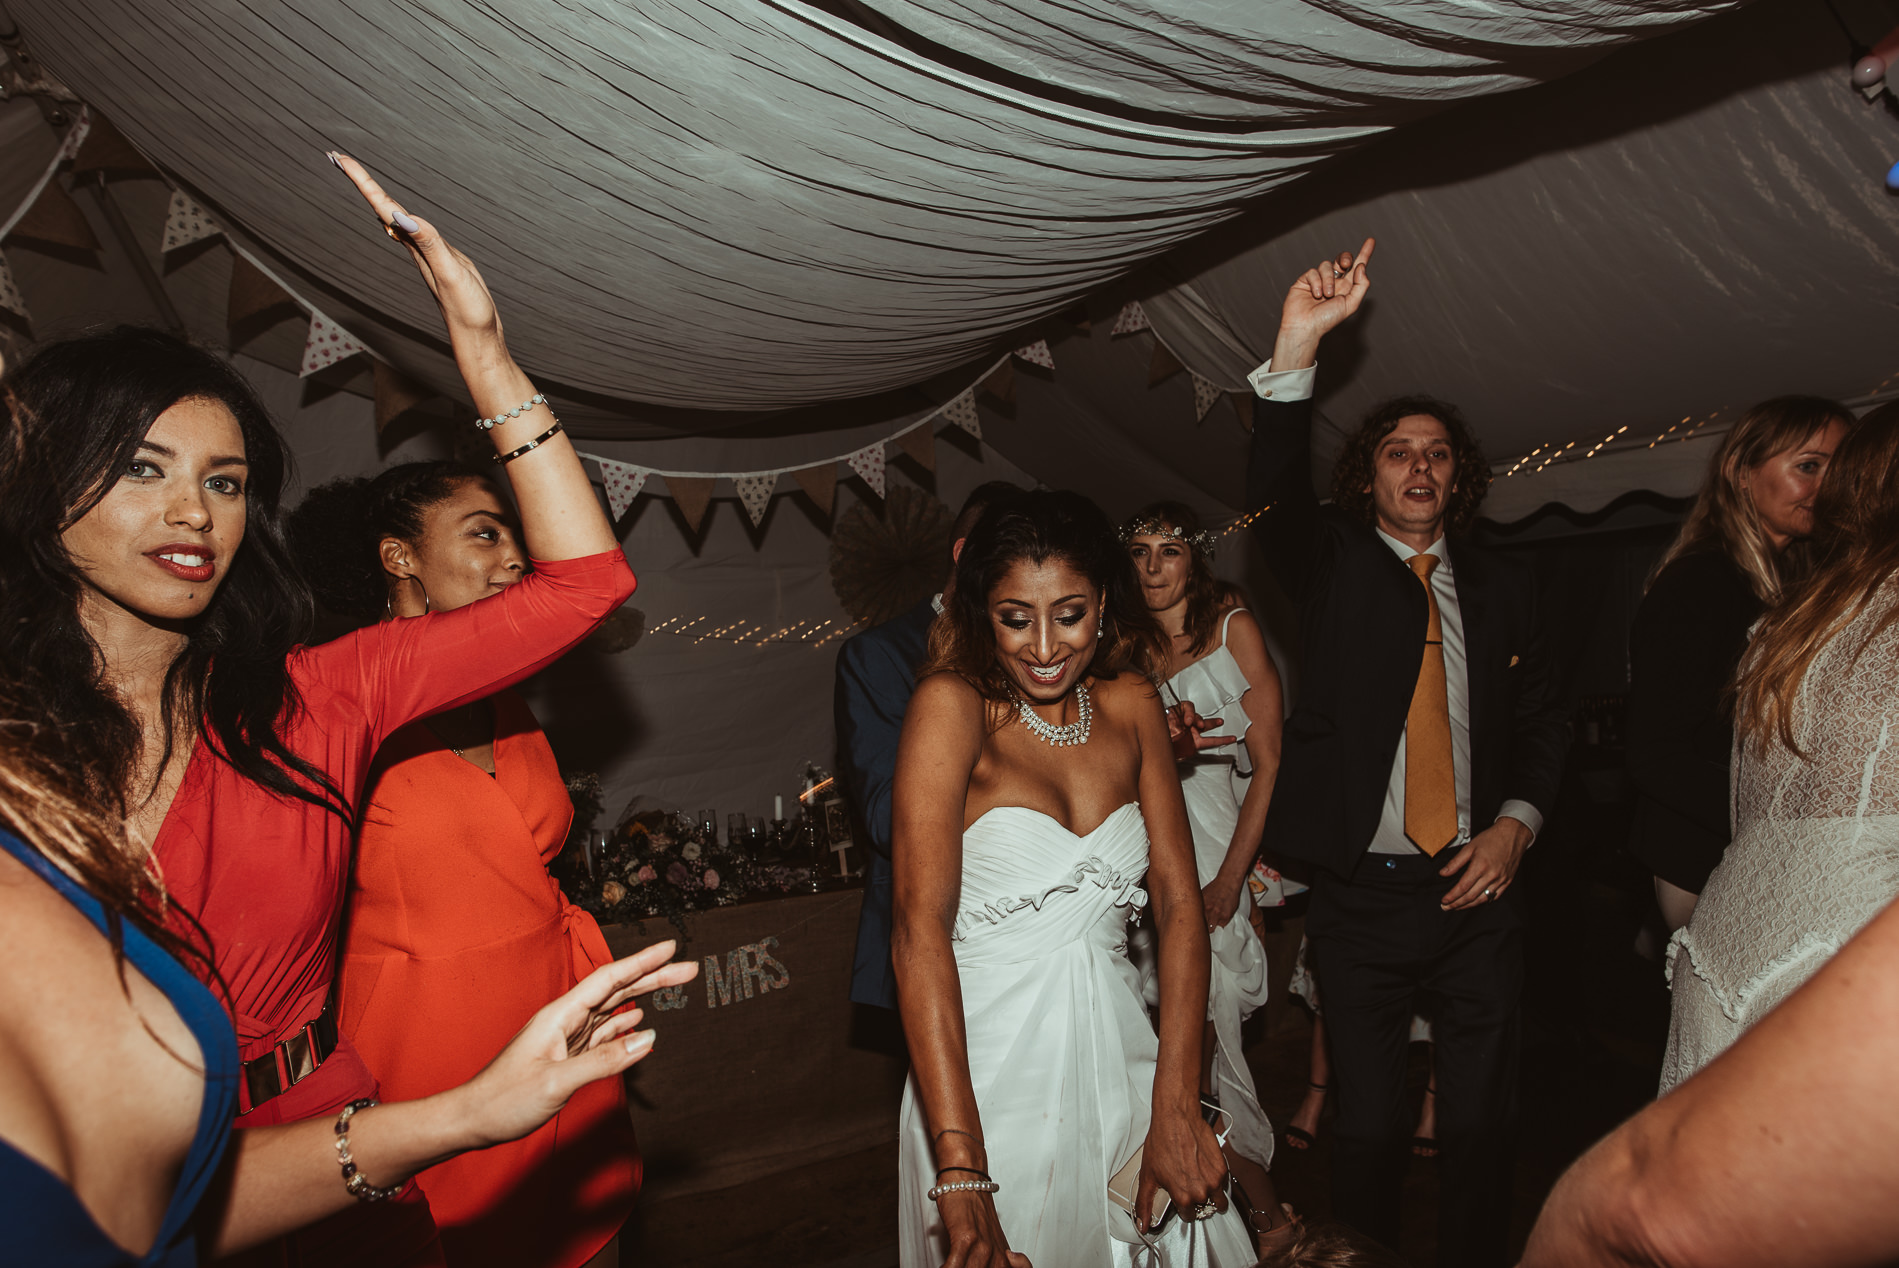 bohemian_wedding_lawshall_church_garden85